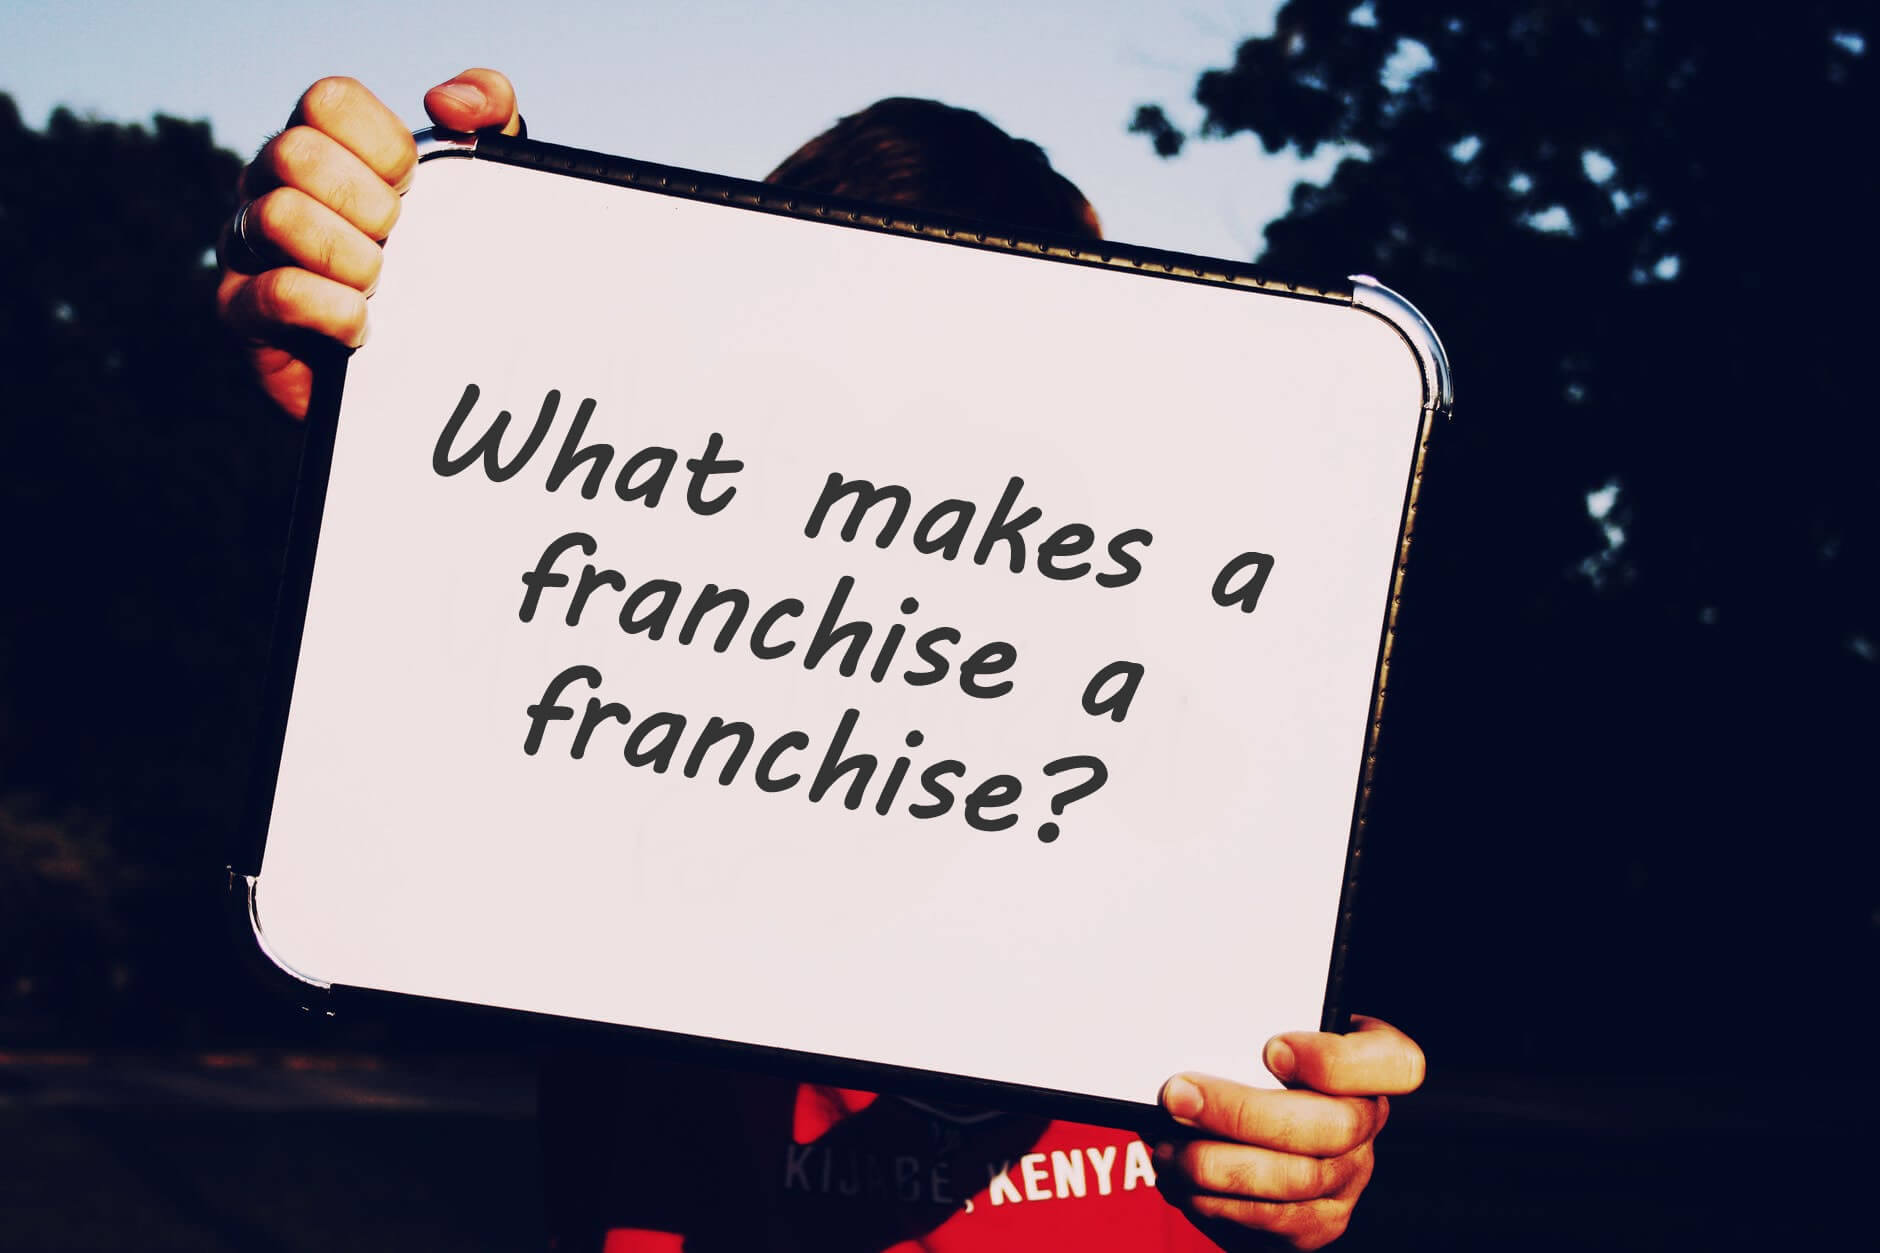 What makes a franchise, a franchise?